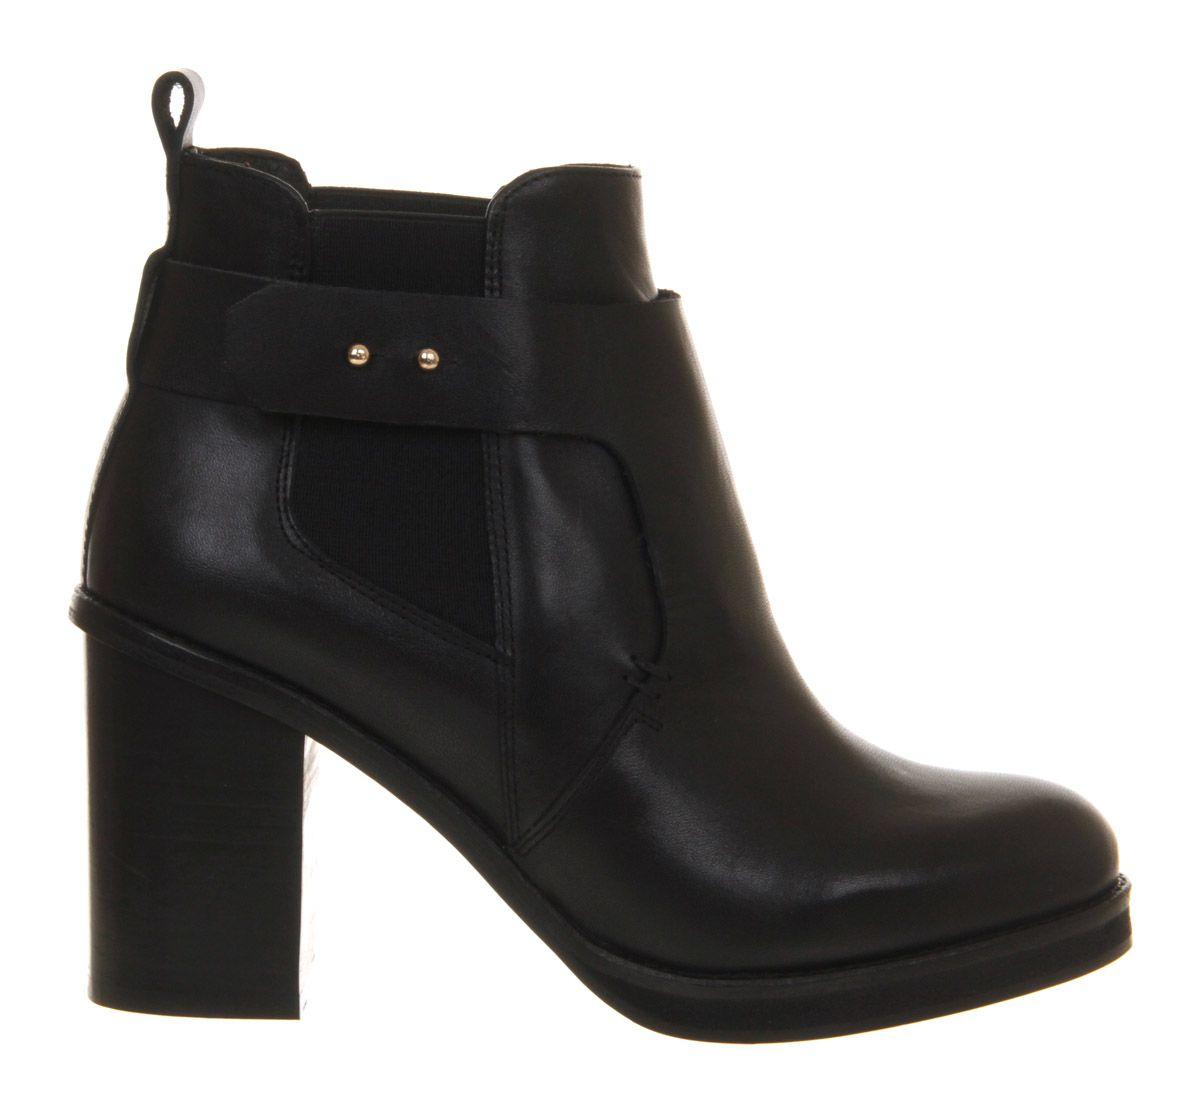 Office Marissa Block Heel Ankle Boots in Black Leather (Black)